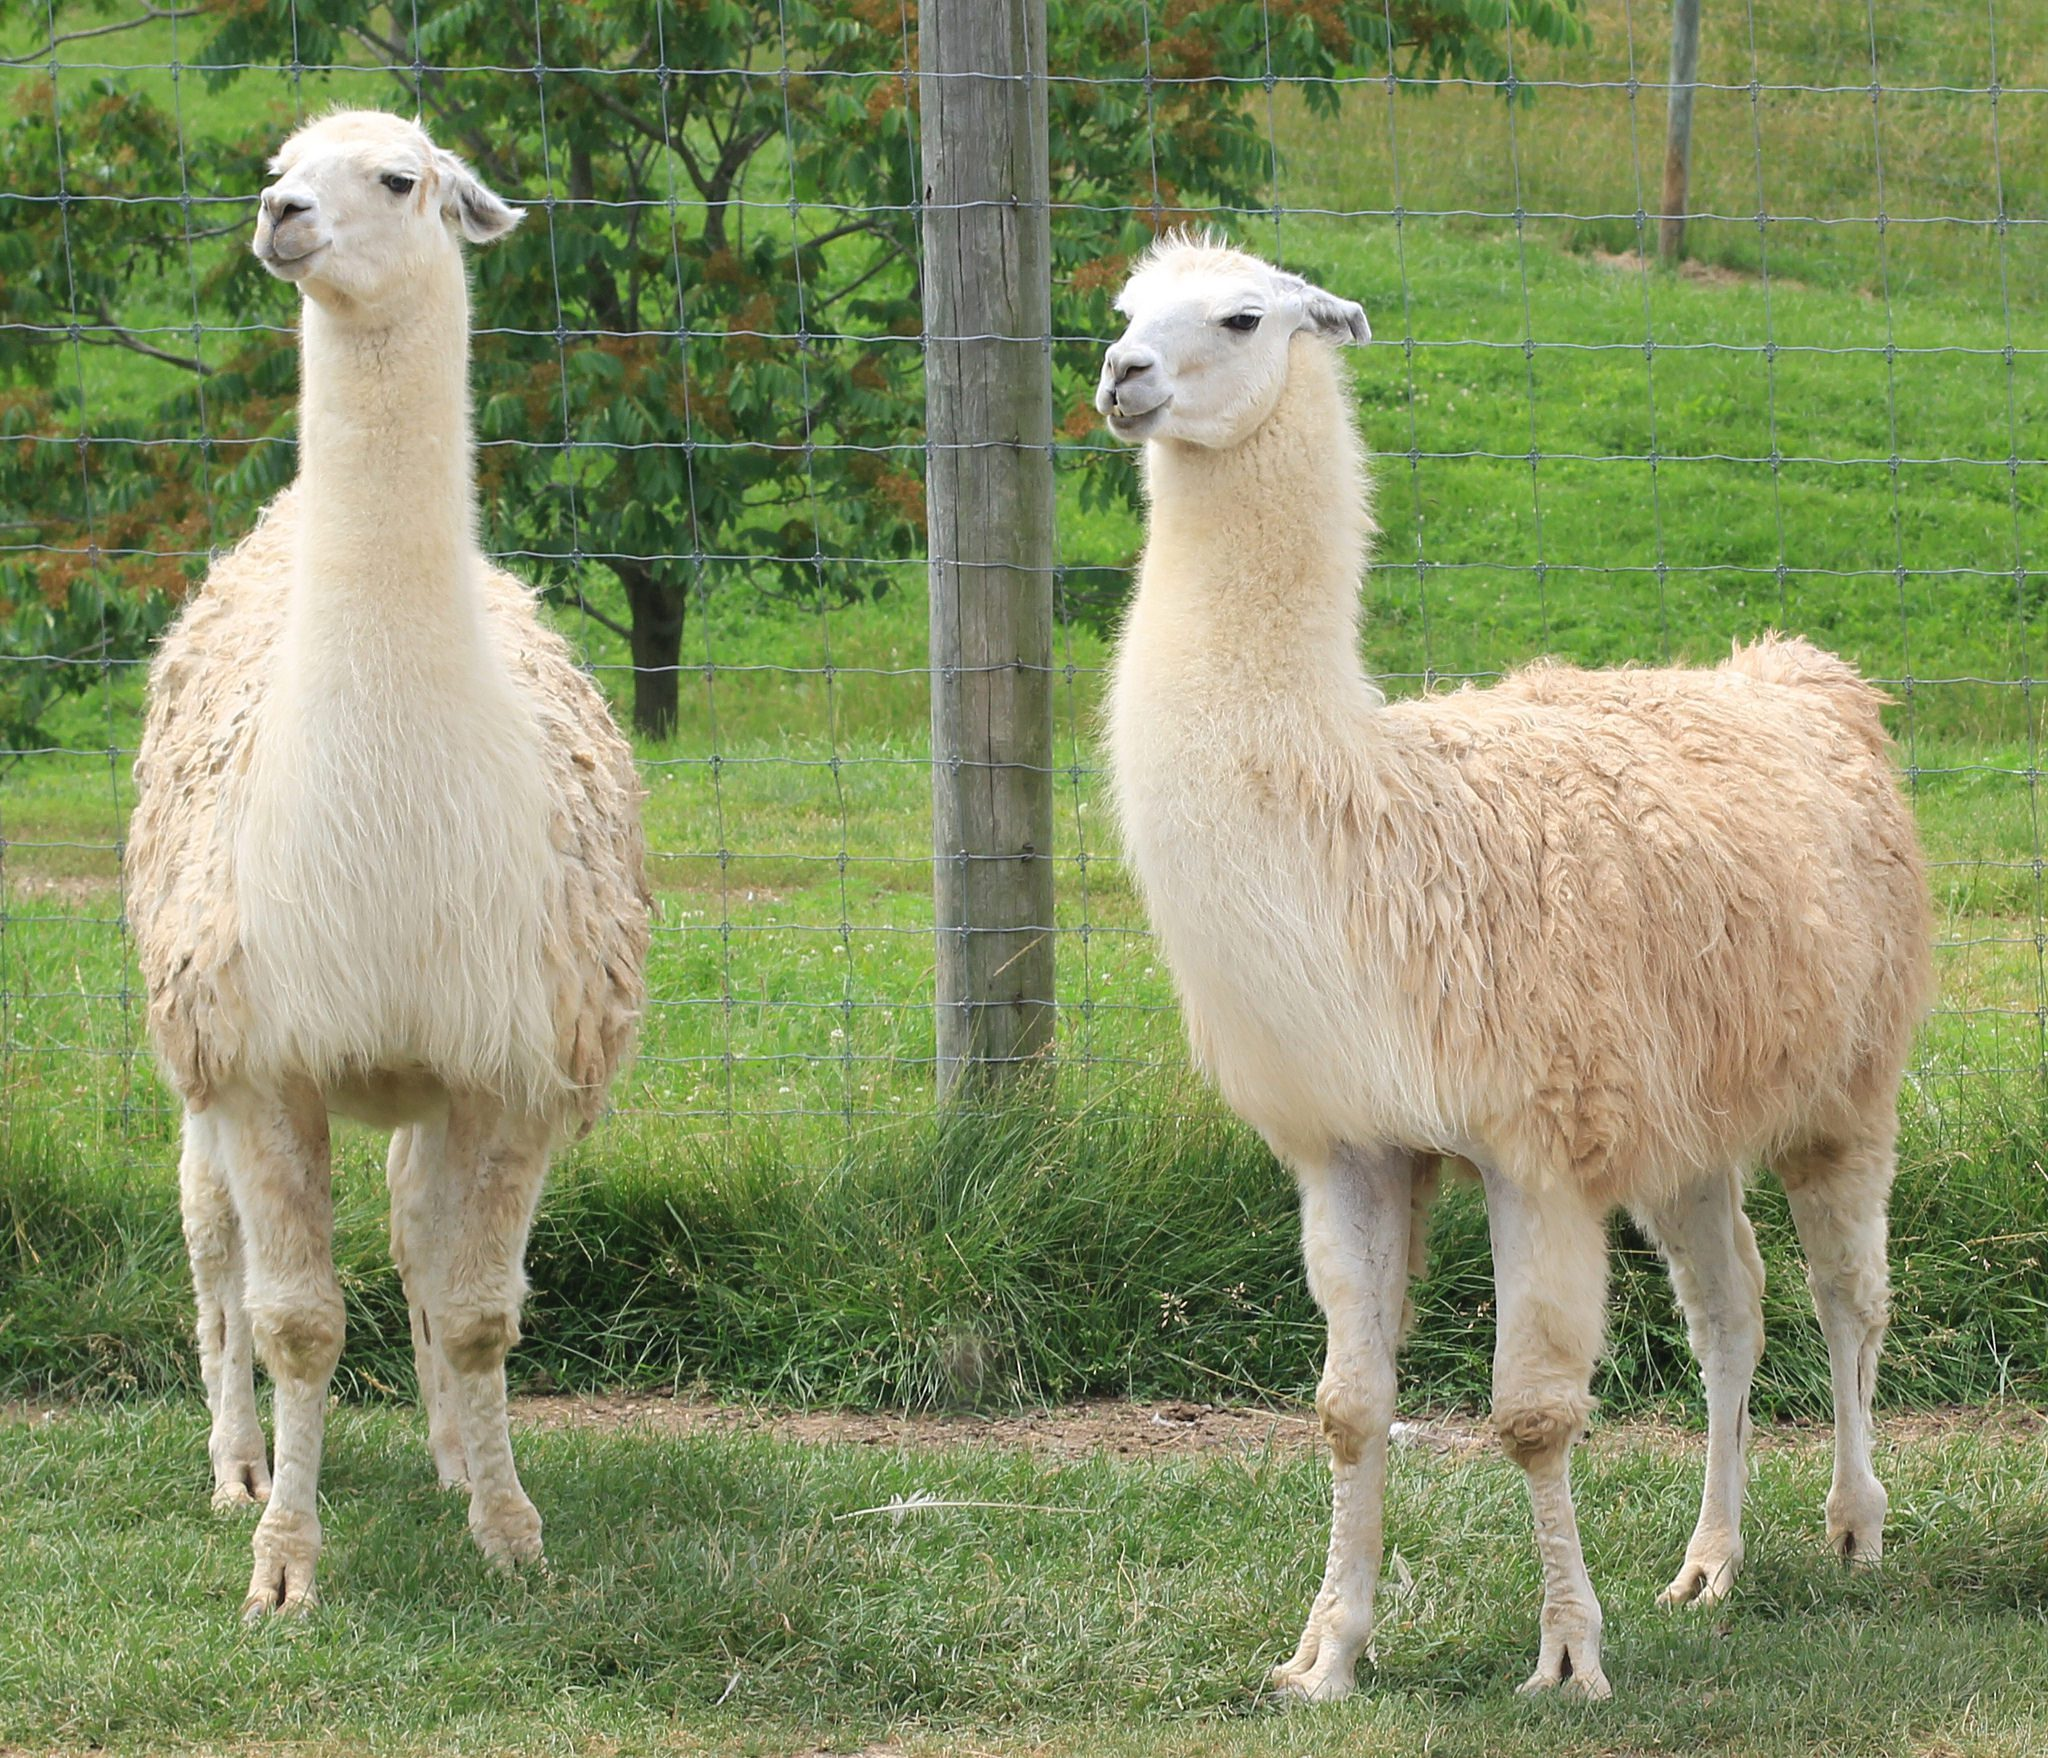 Llama - Key Facts, Information & Pictures Llamas The Animal